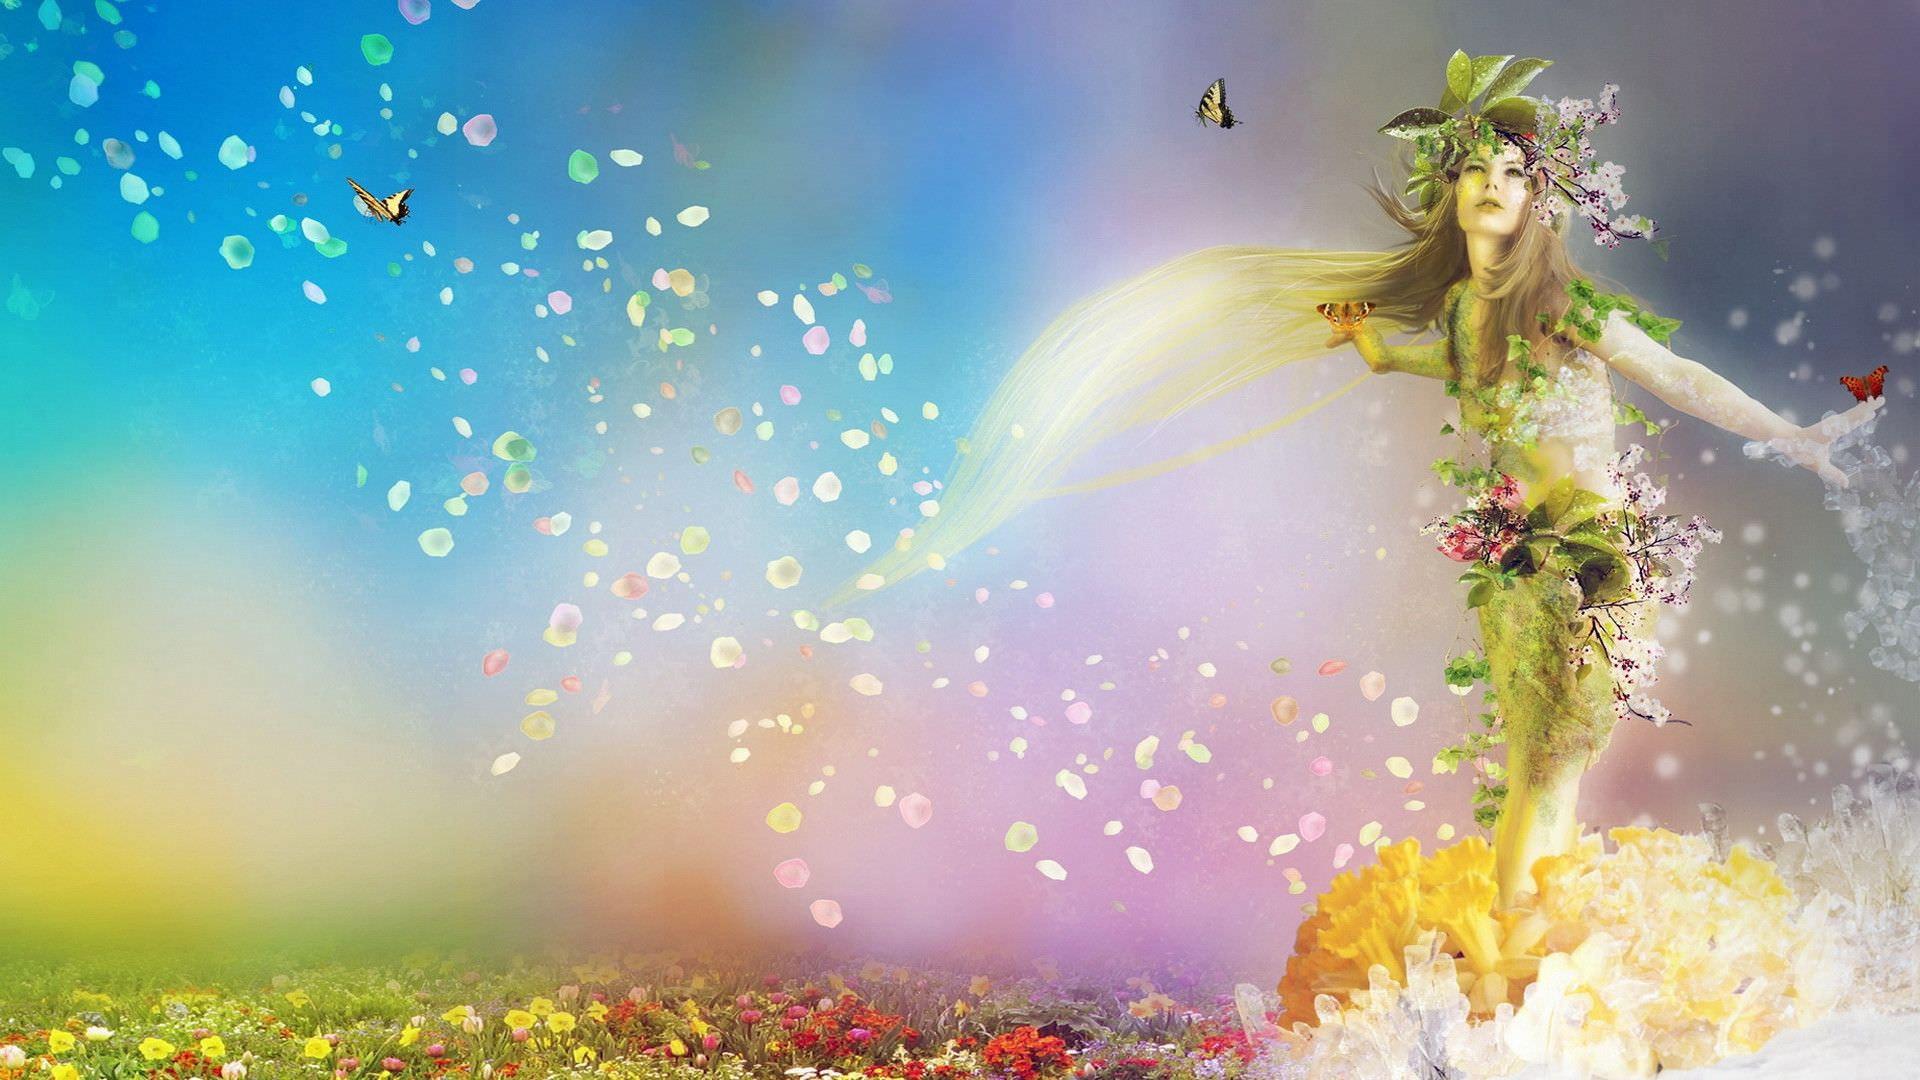 Animated Sky Angel Wallpaper